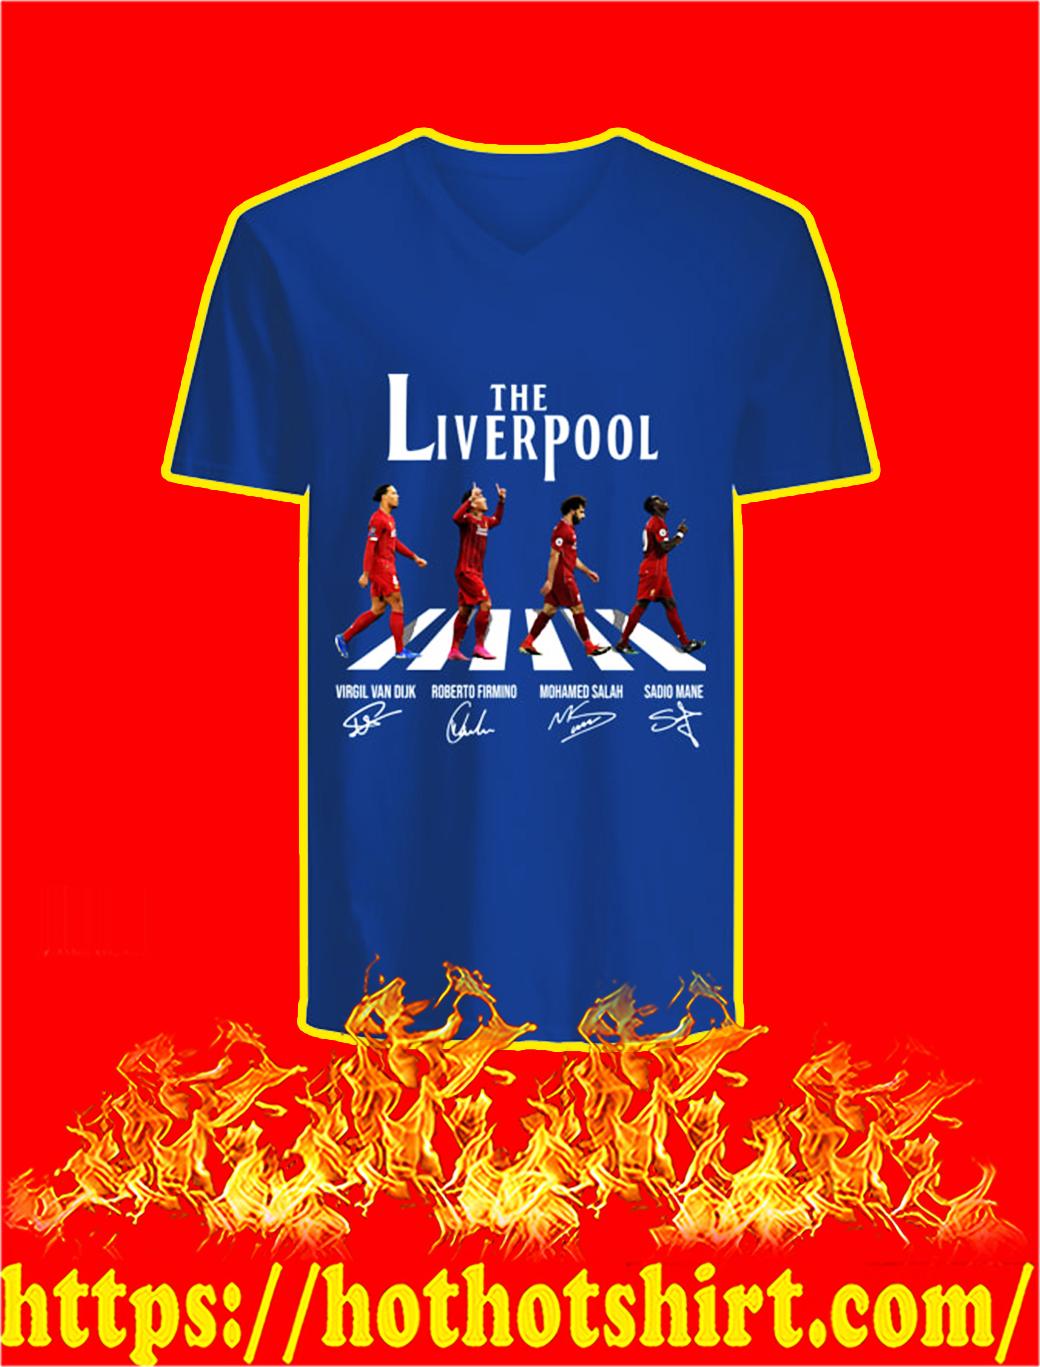 The Liverpool Abbey Road Virgin Firmino Salah Mane Signature v-neck